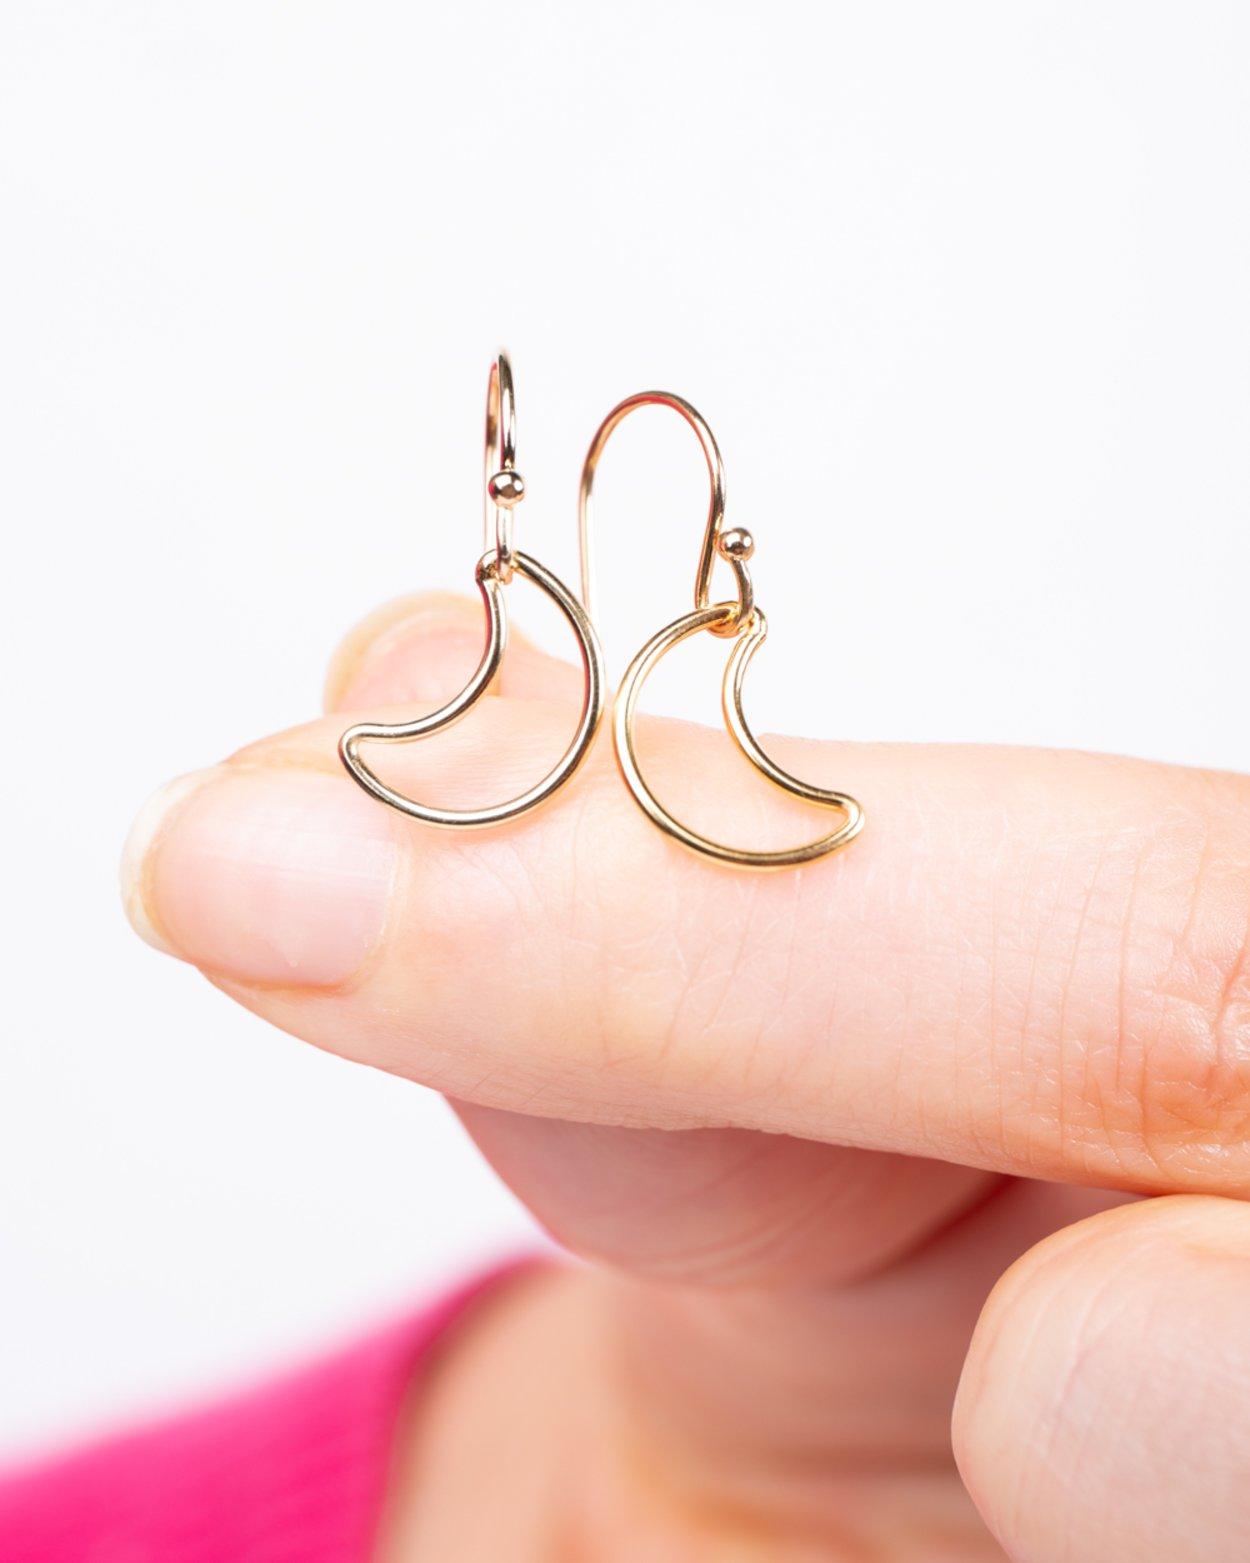 14kt Gold Filled Moon Charm Earrings